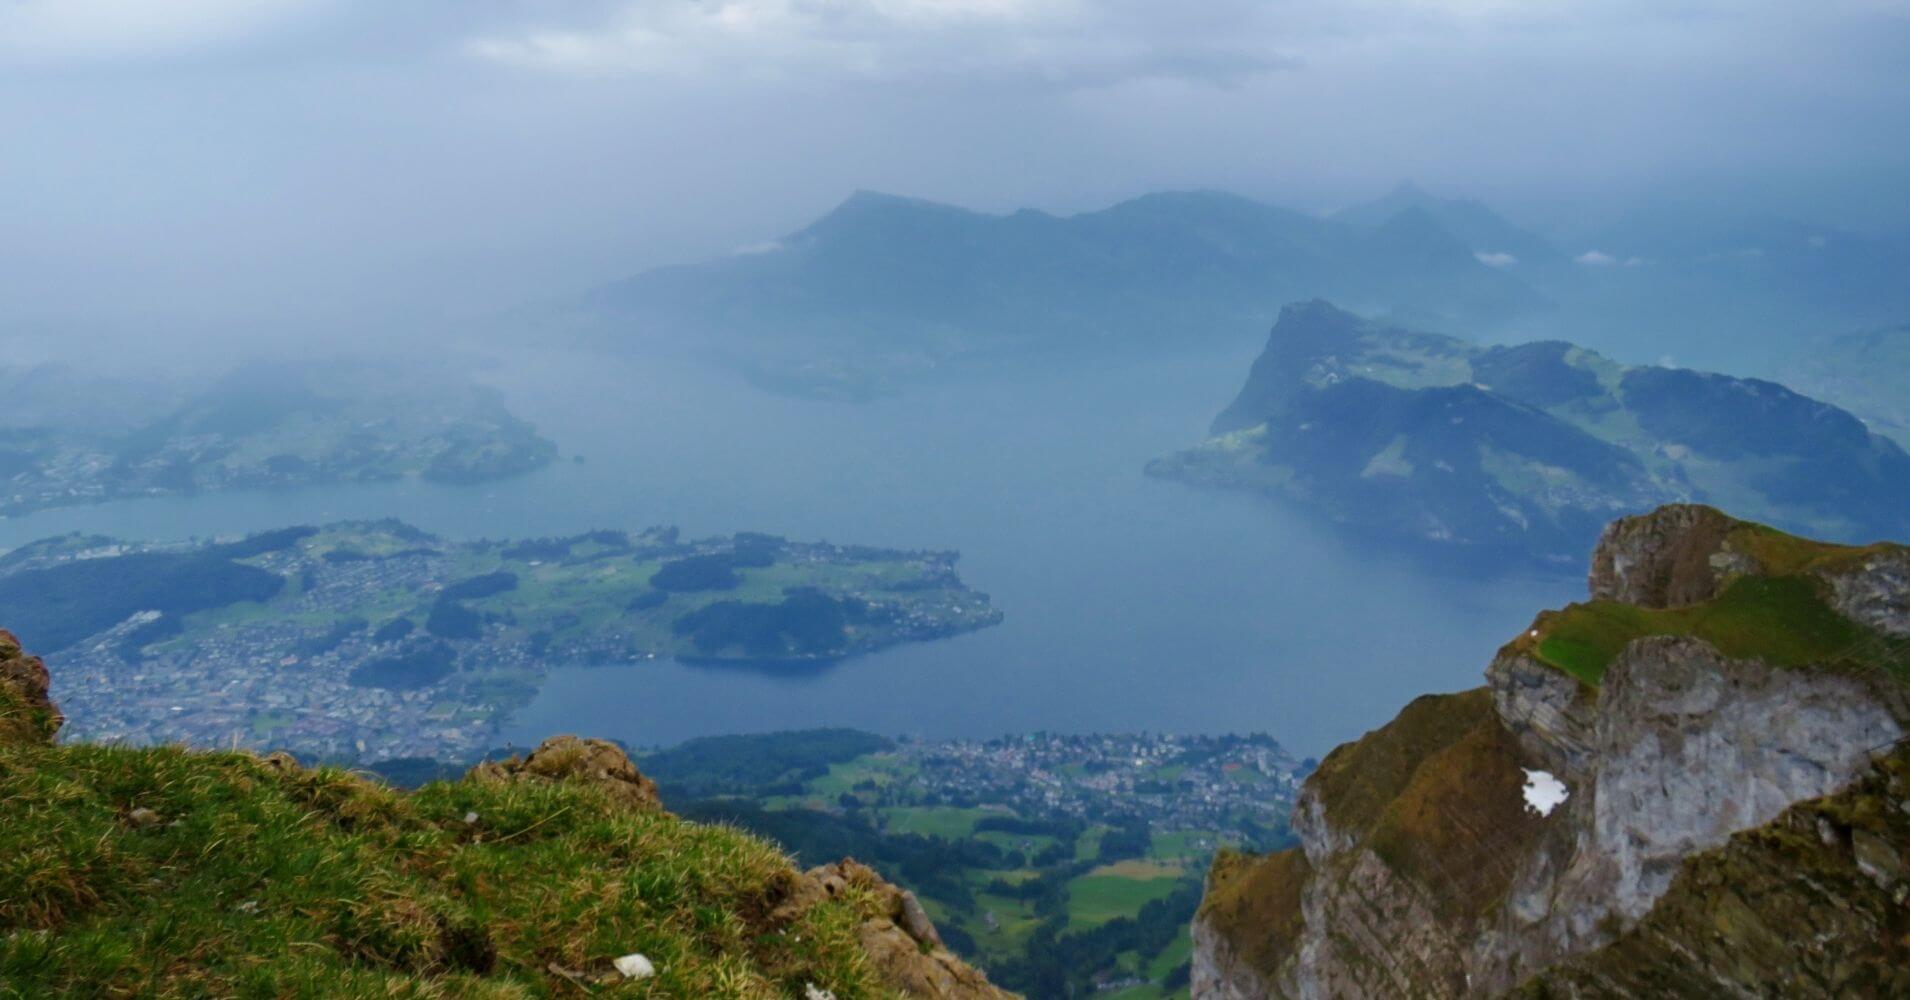 Panorámicas desde la Cumbre. Lucerna, Suiza.